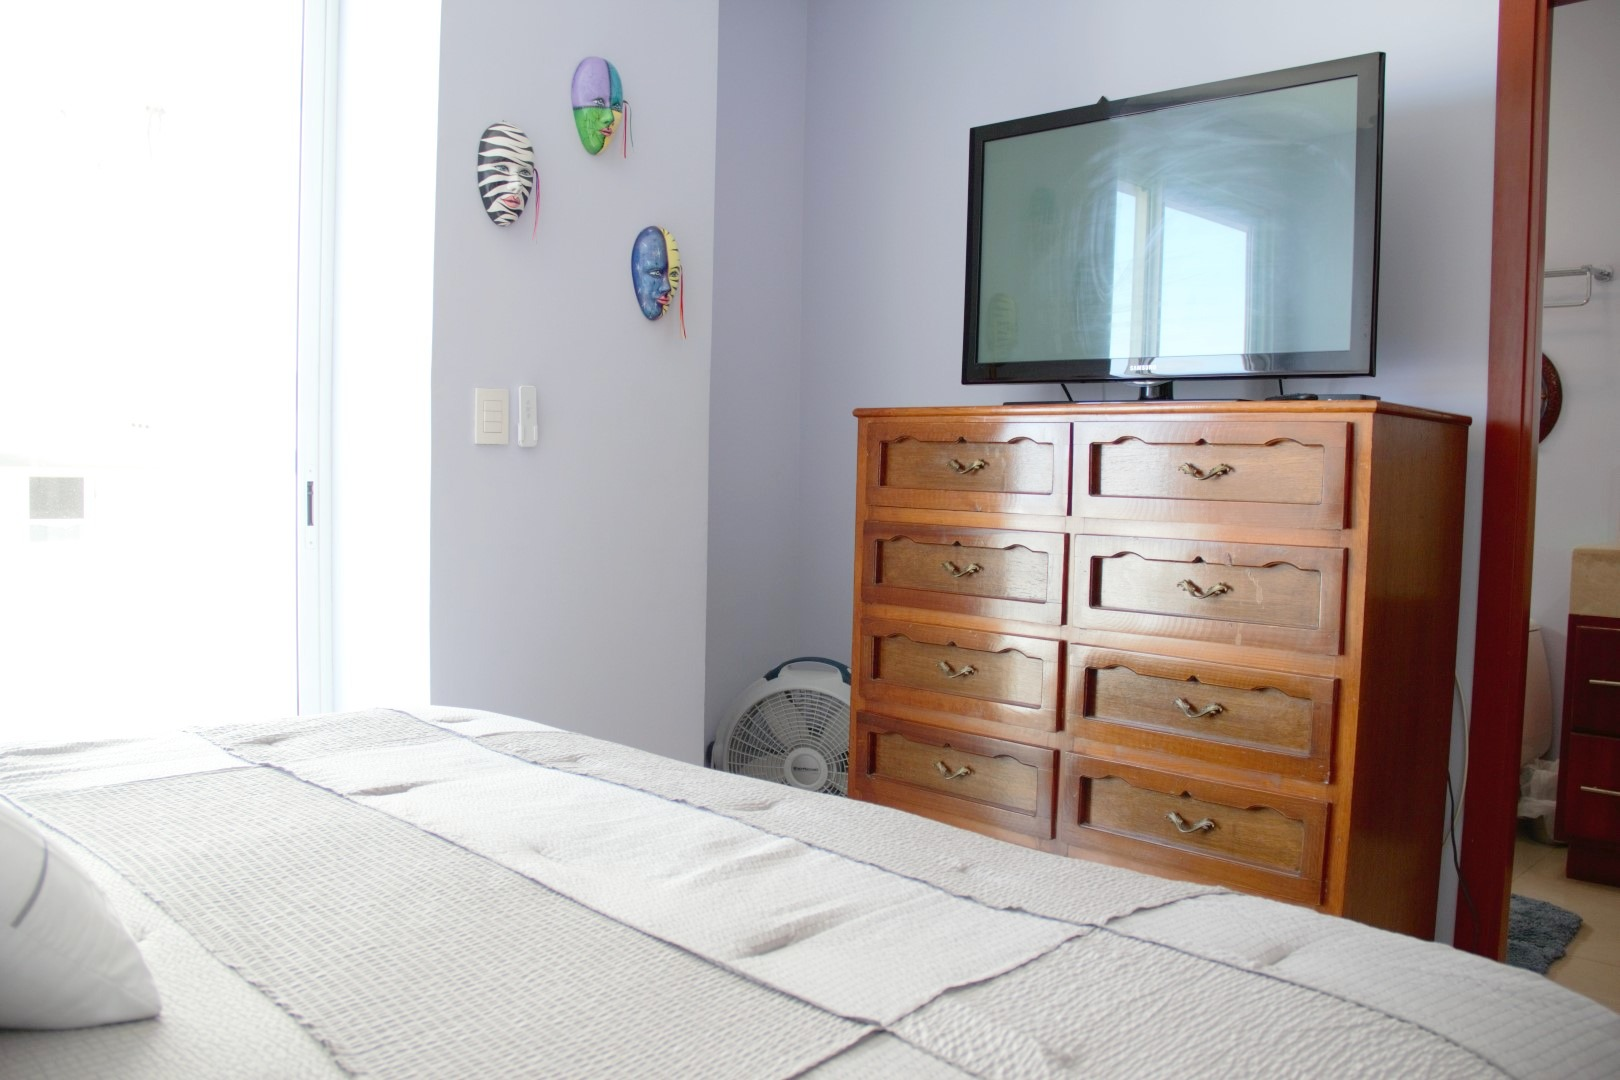 TV and dresser in second bedroom.